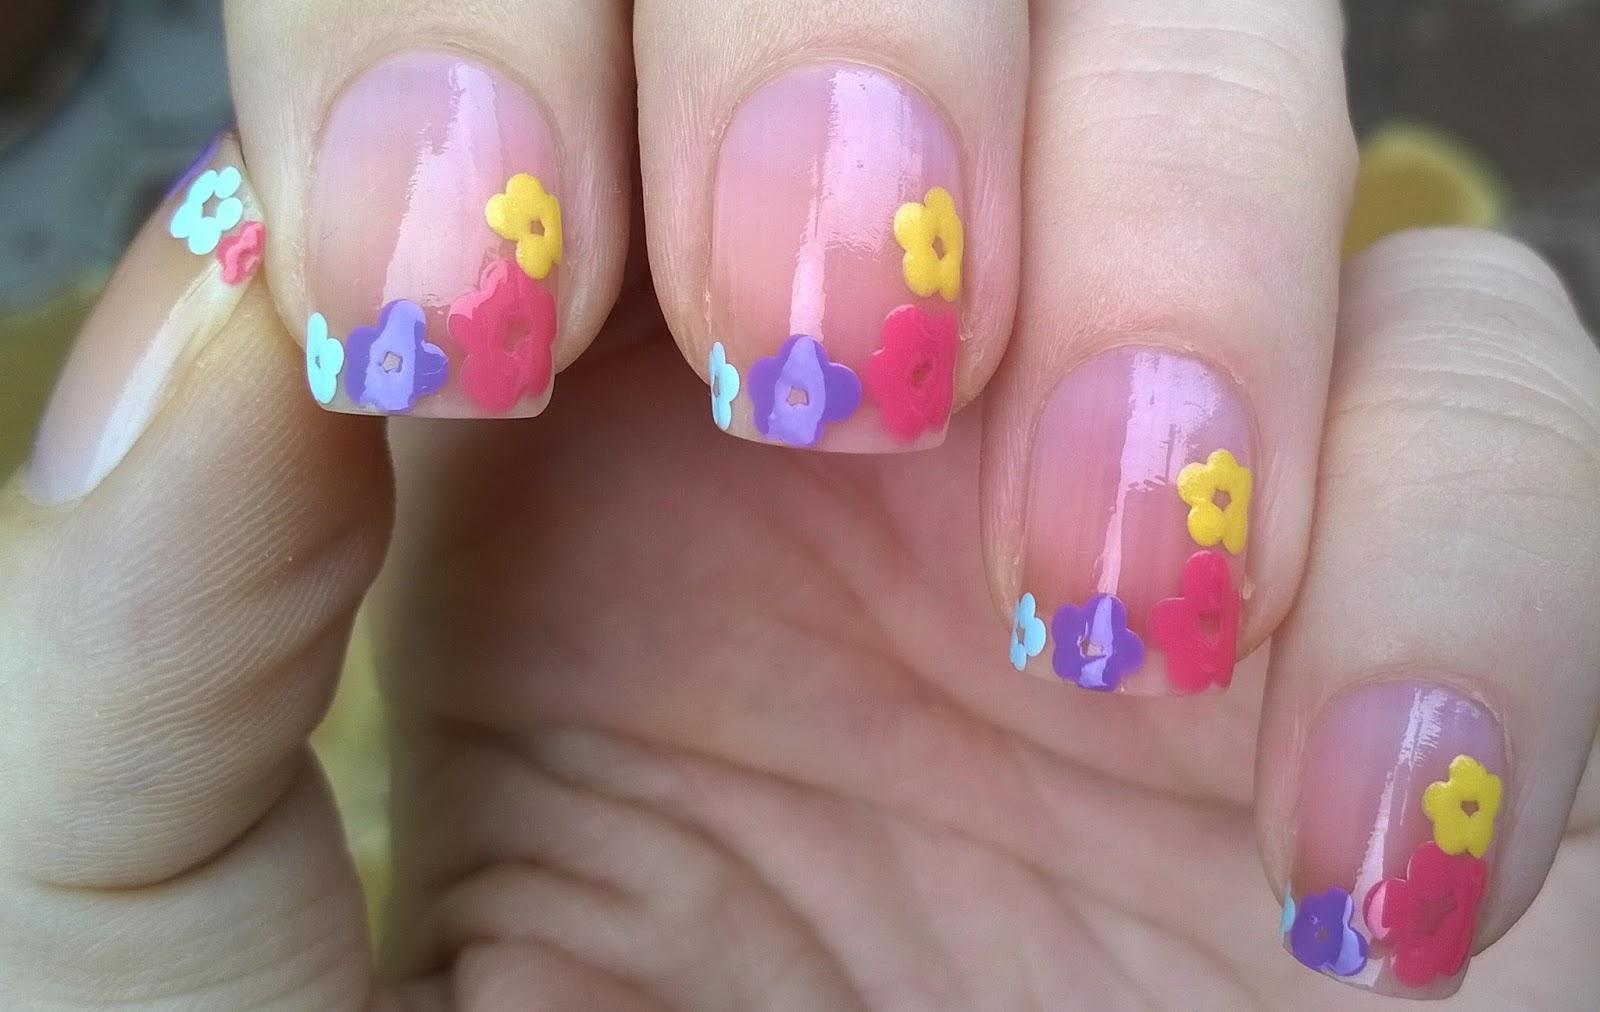 Life World Women: Sheer Pink Nail Art - Flower French Tips